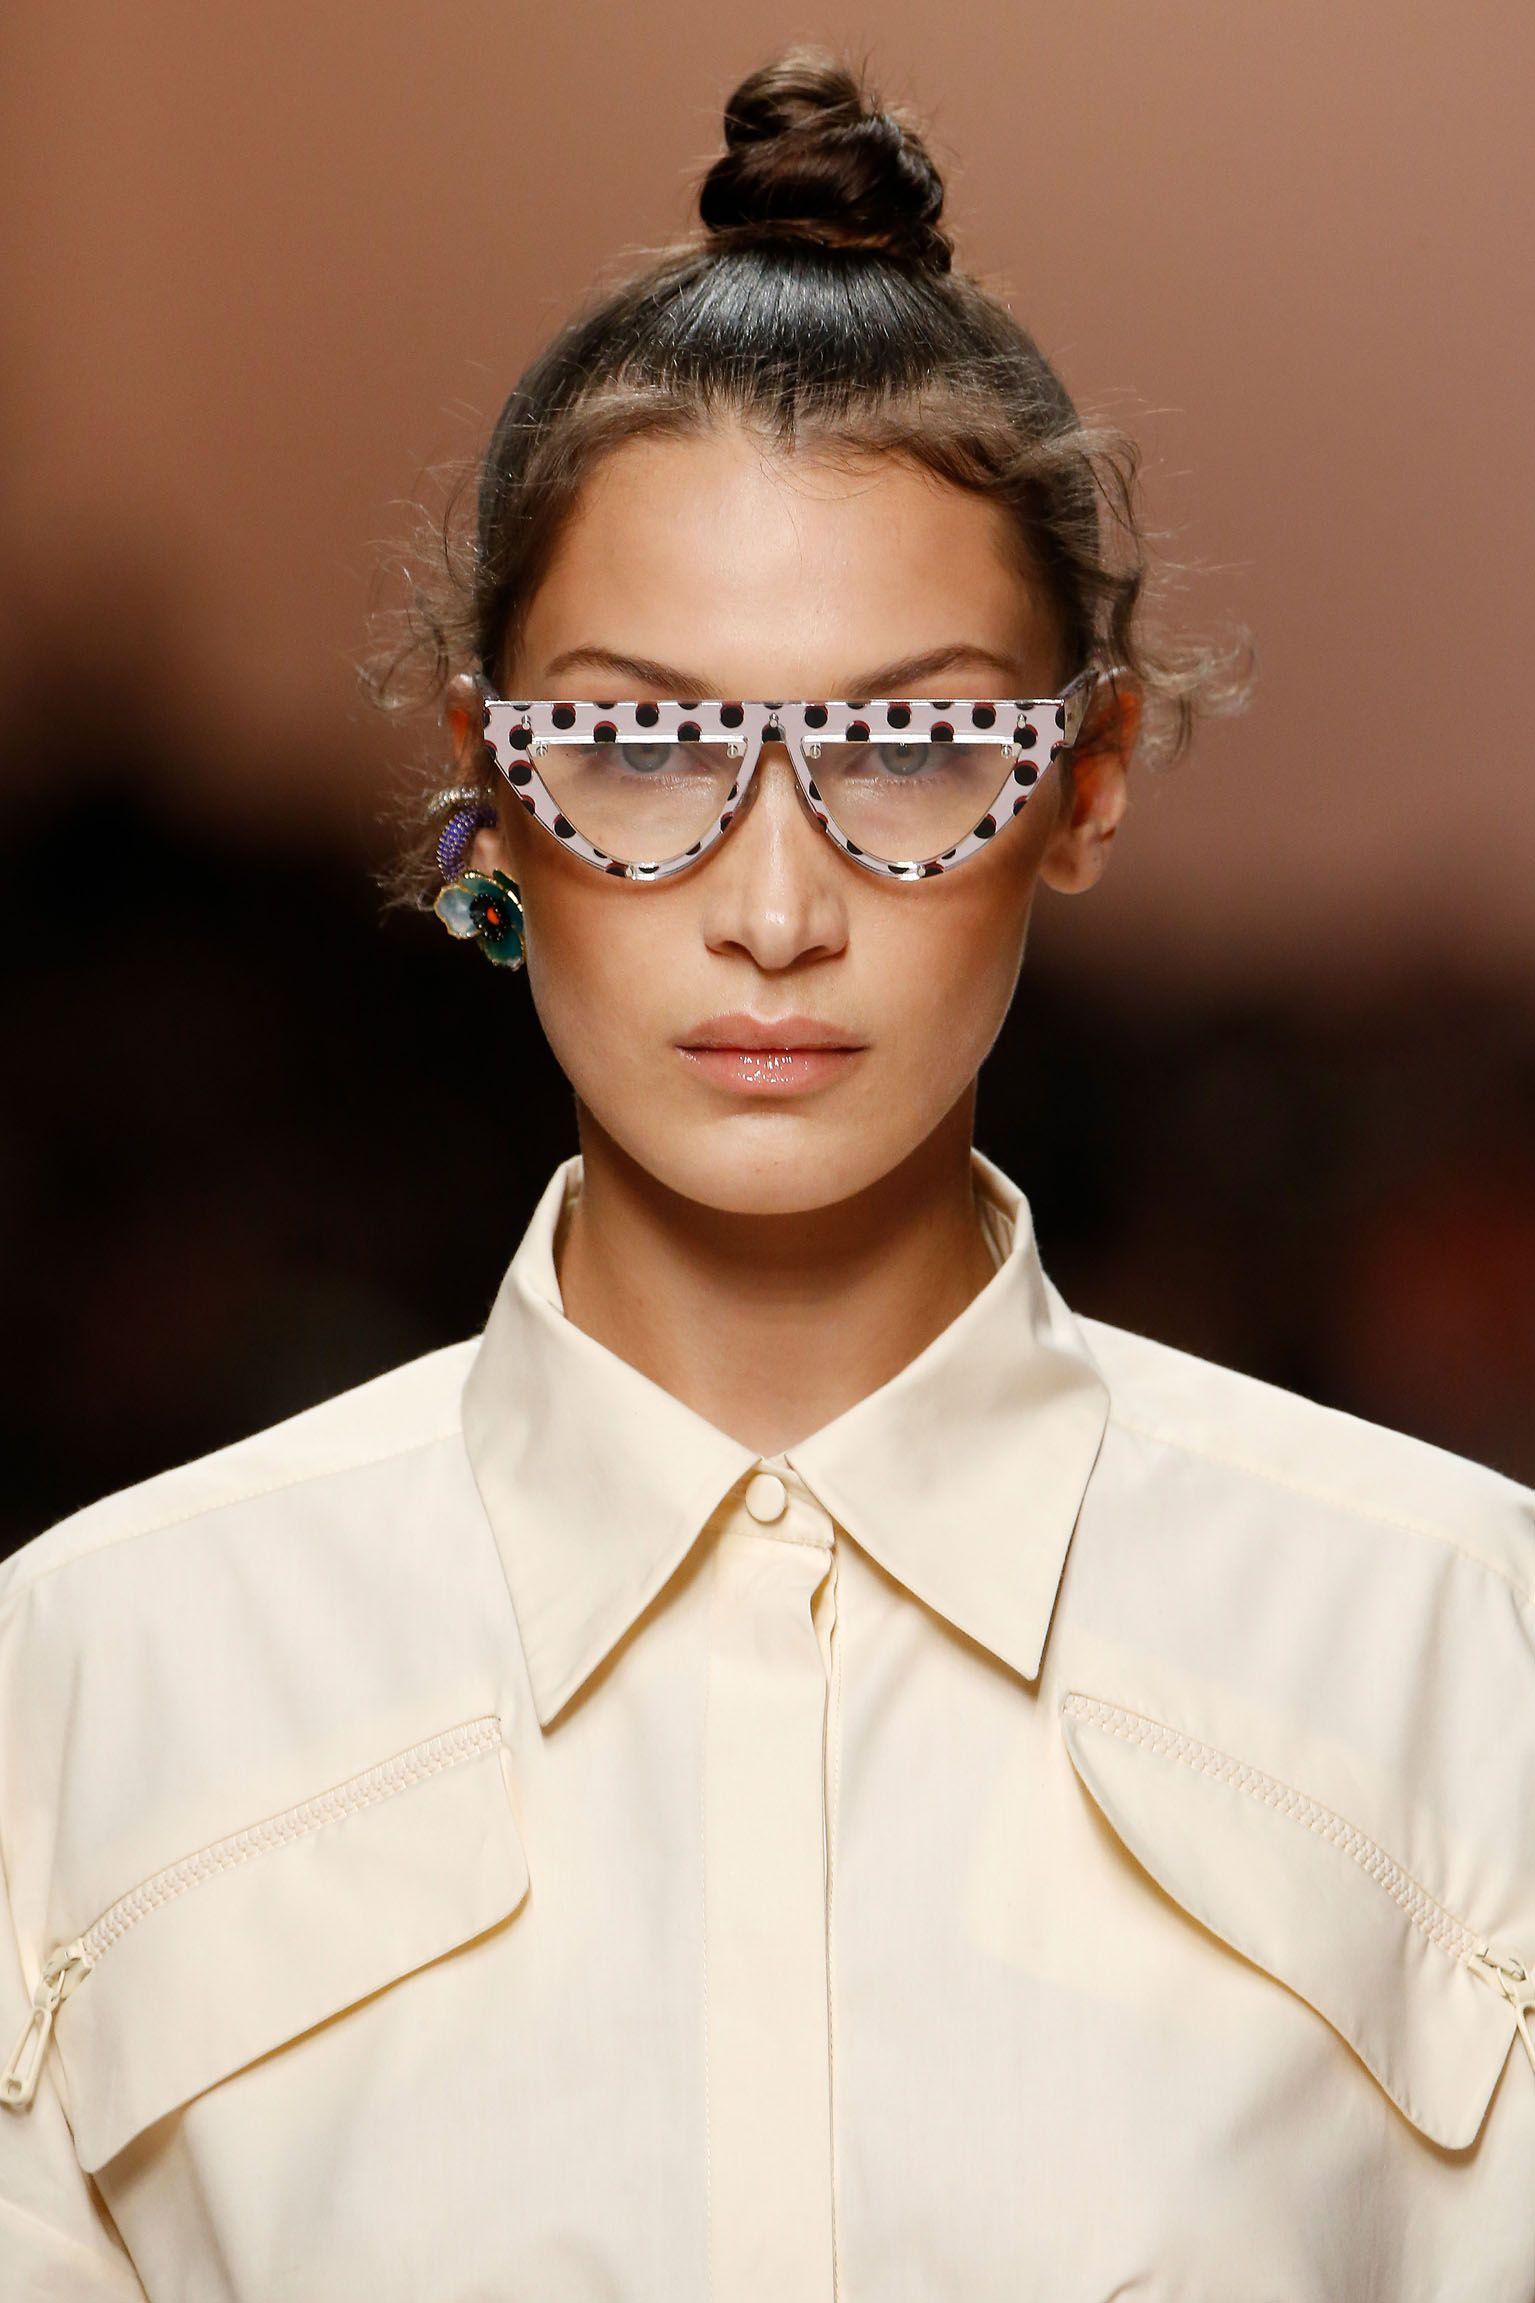 c0f970686441 Fendi Women's Spring/Summer 2019 Fashion Show | accessories in 2019 ...